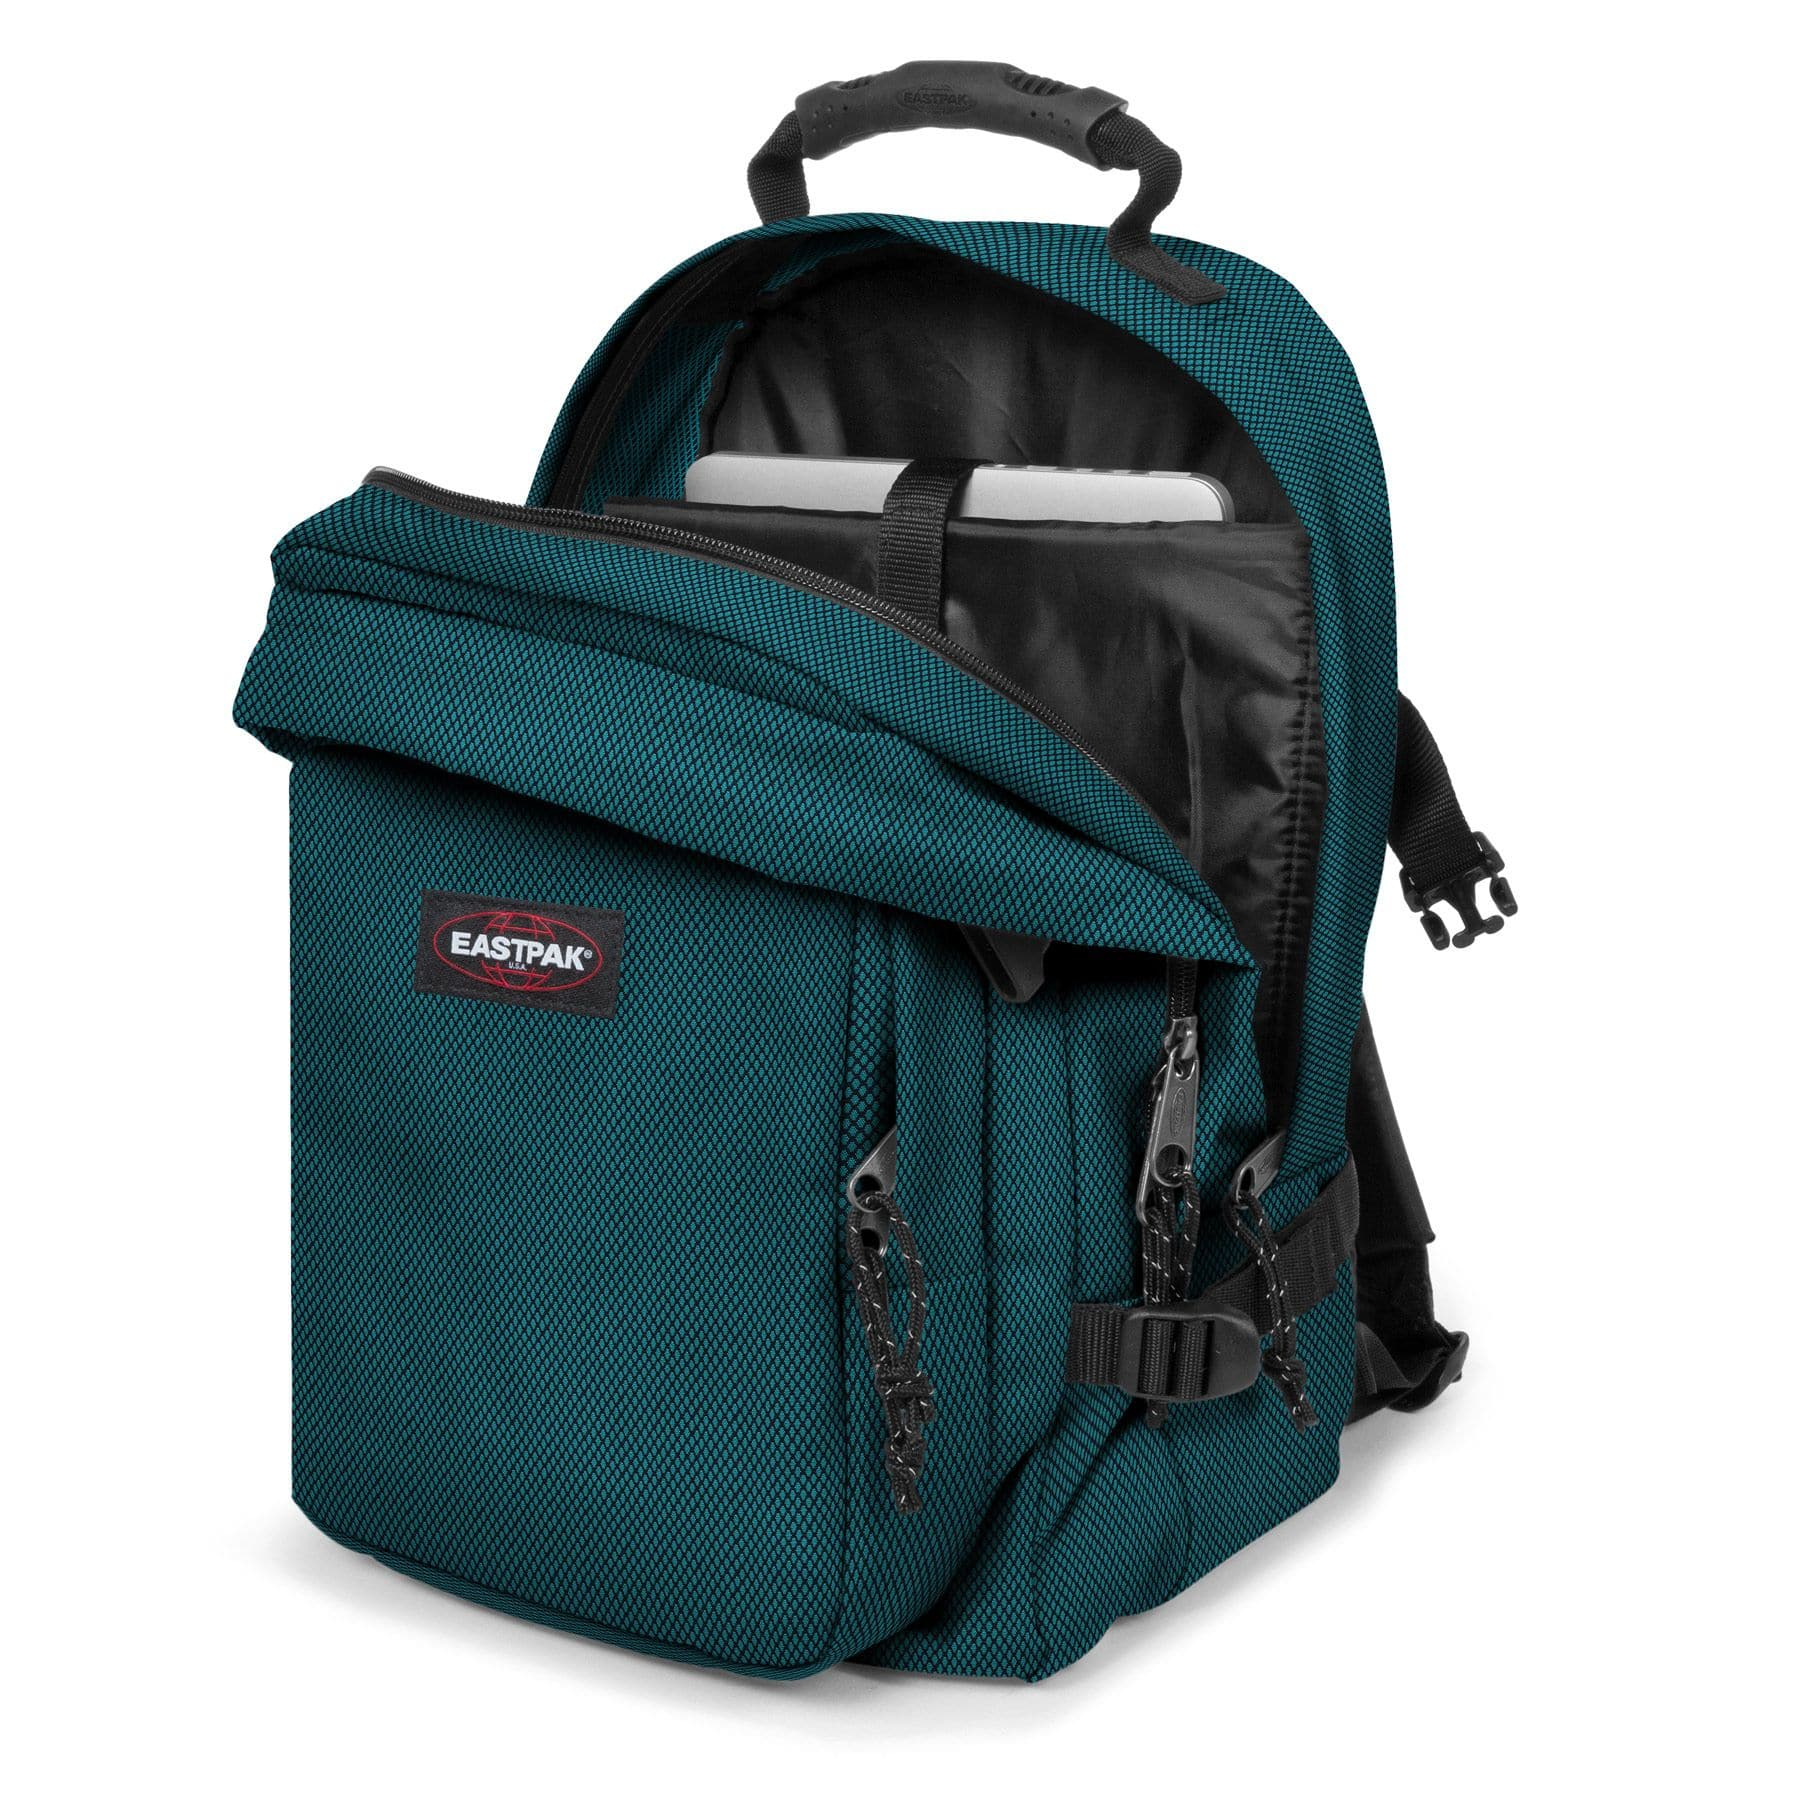 Eastpak Provider Meshknit Blue-185017